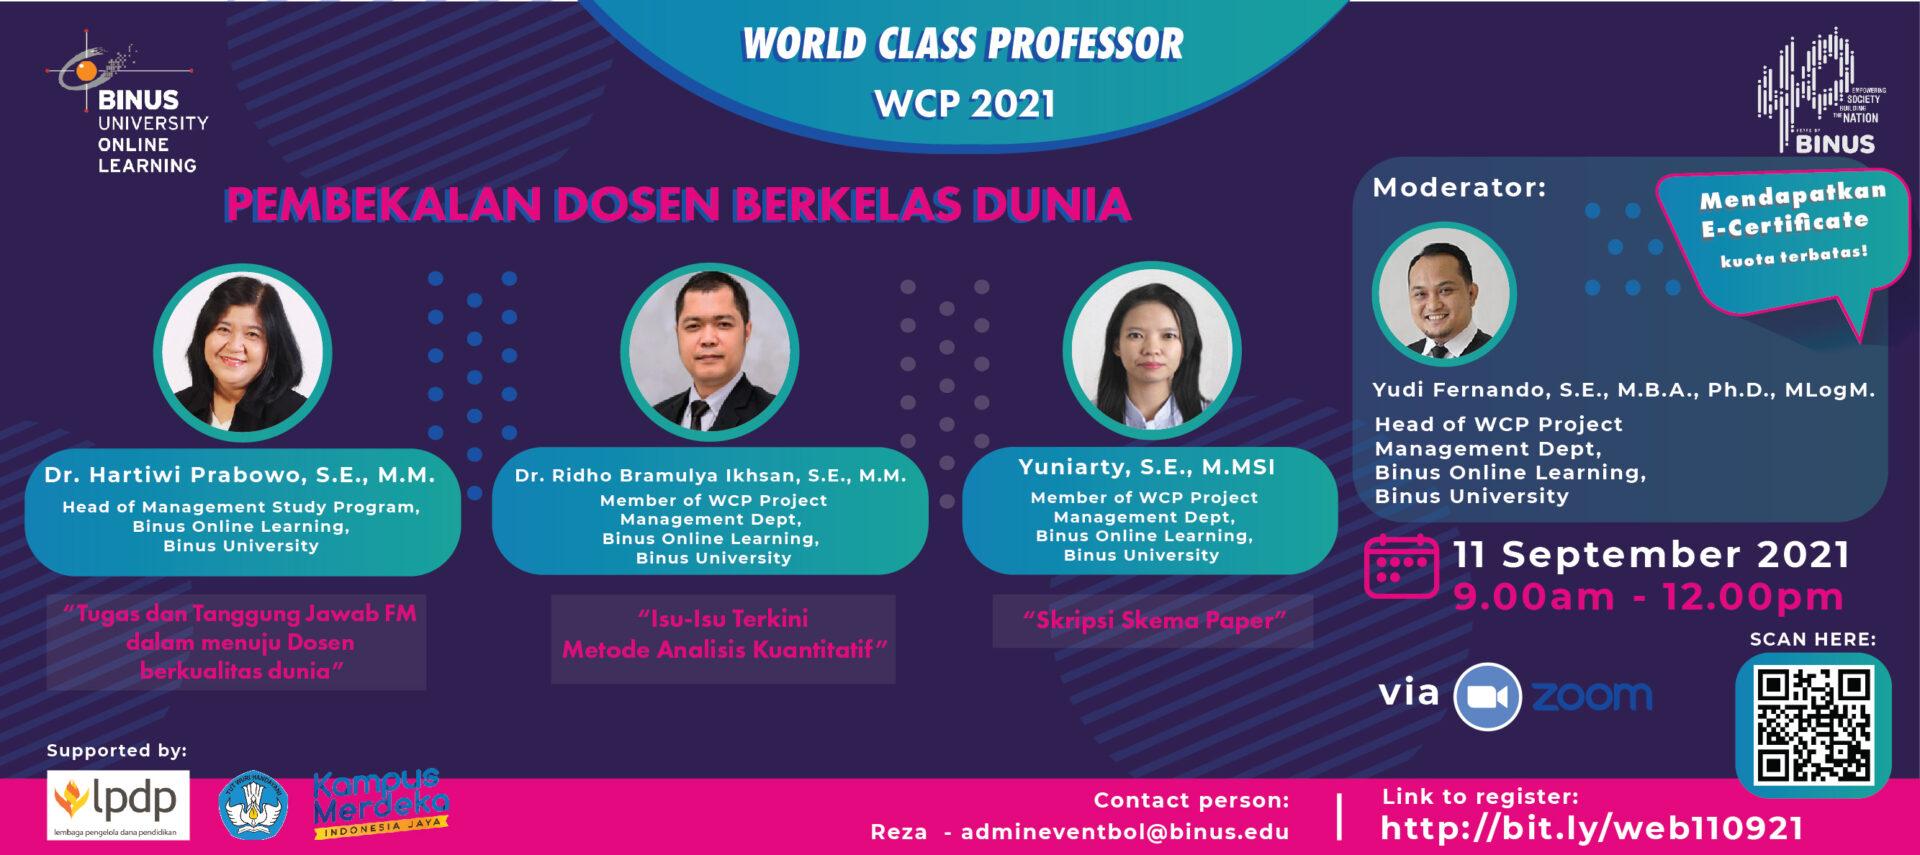 World Class Professor (WCP) – Pembekalan Dosen Berkelas Dunia